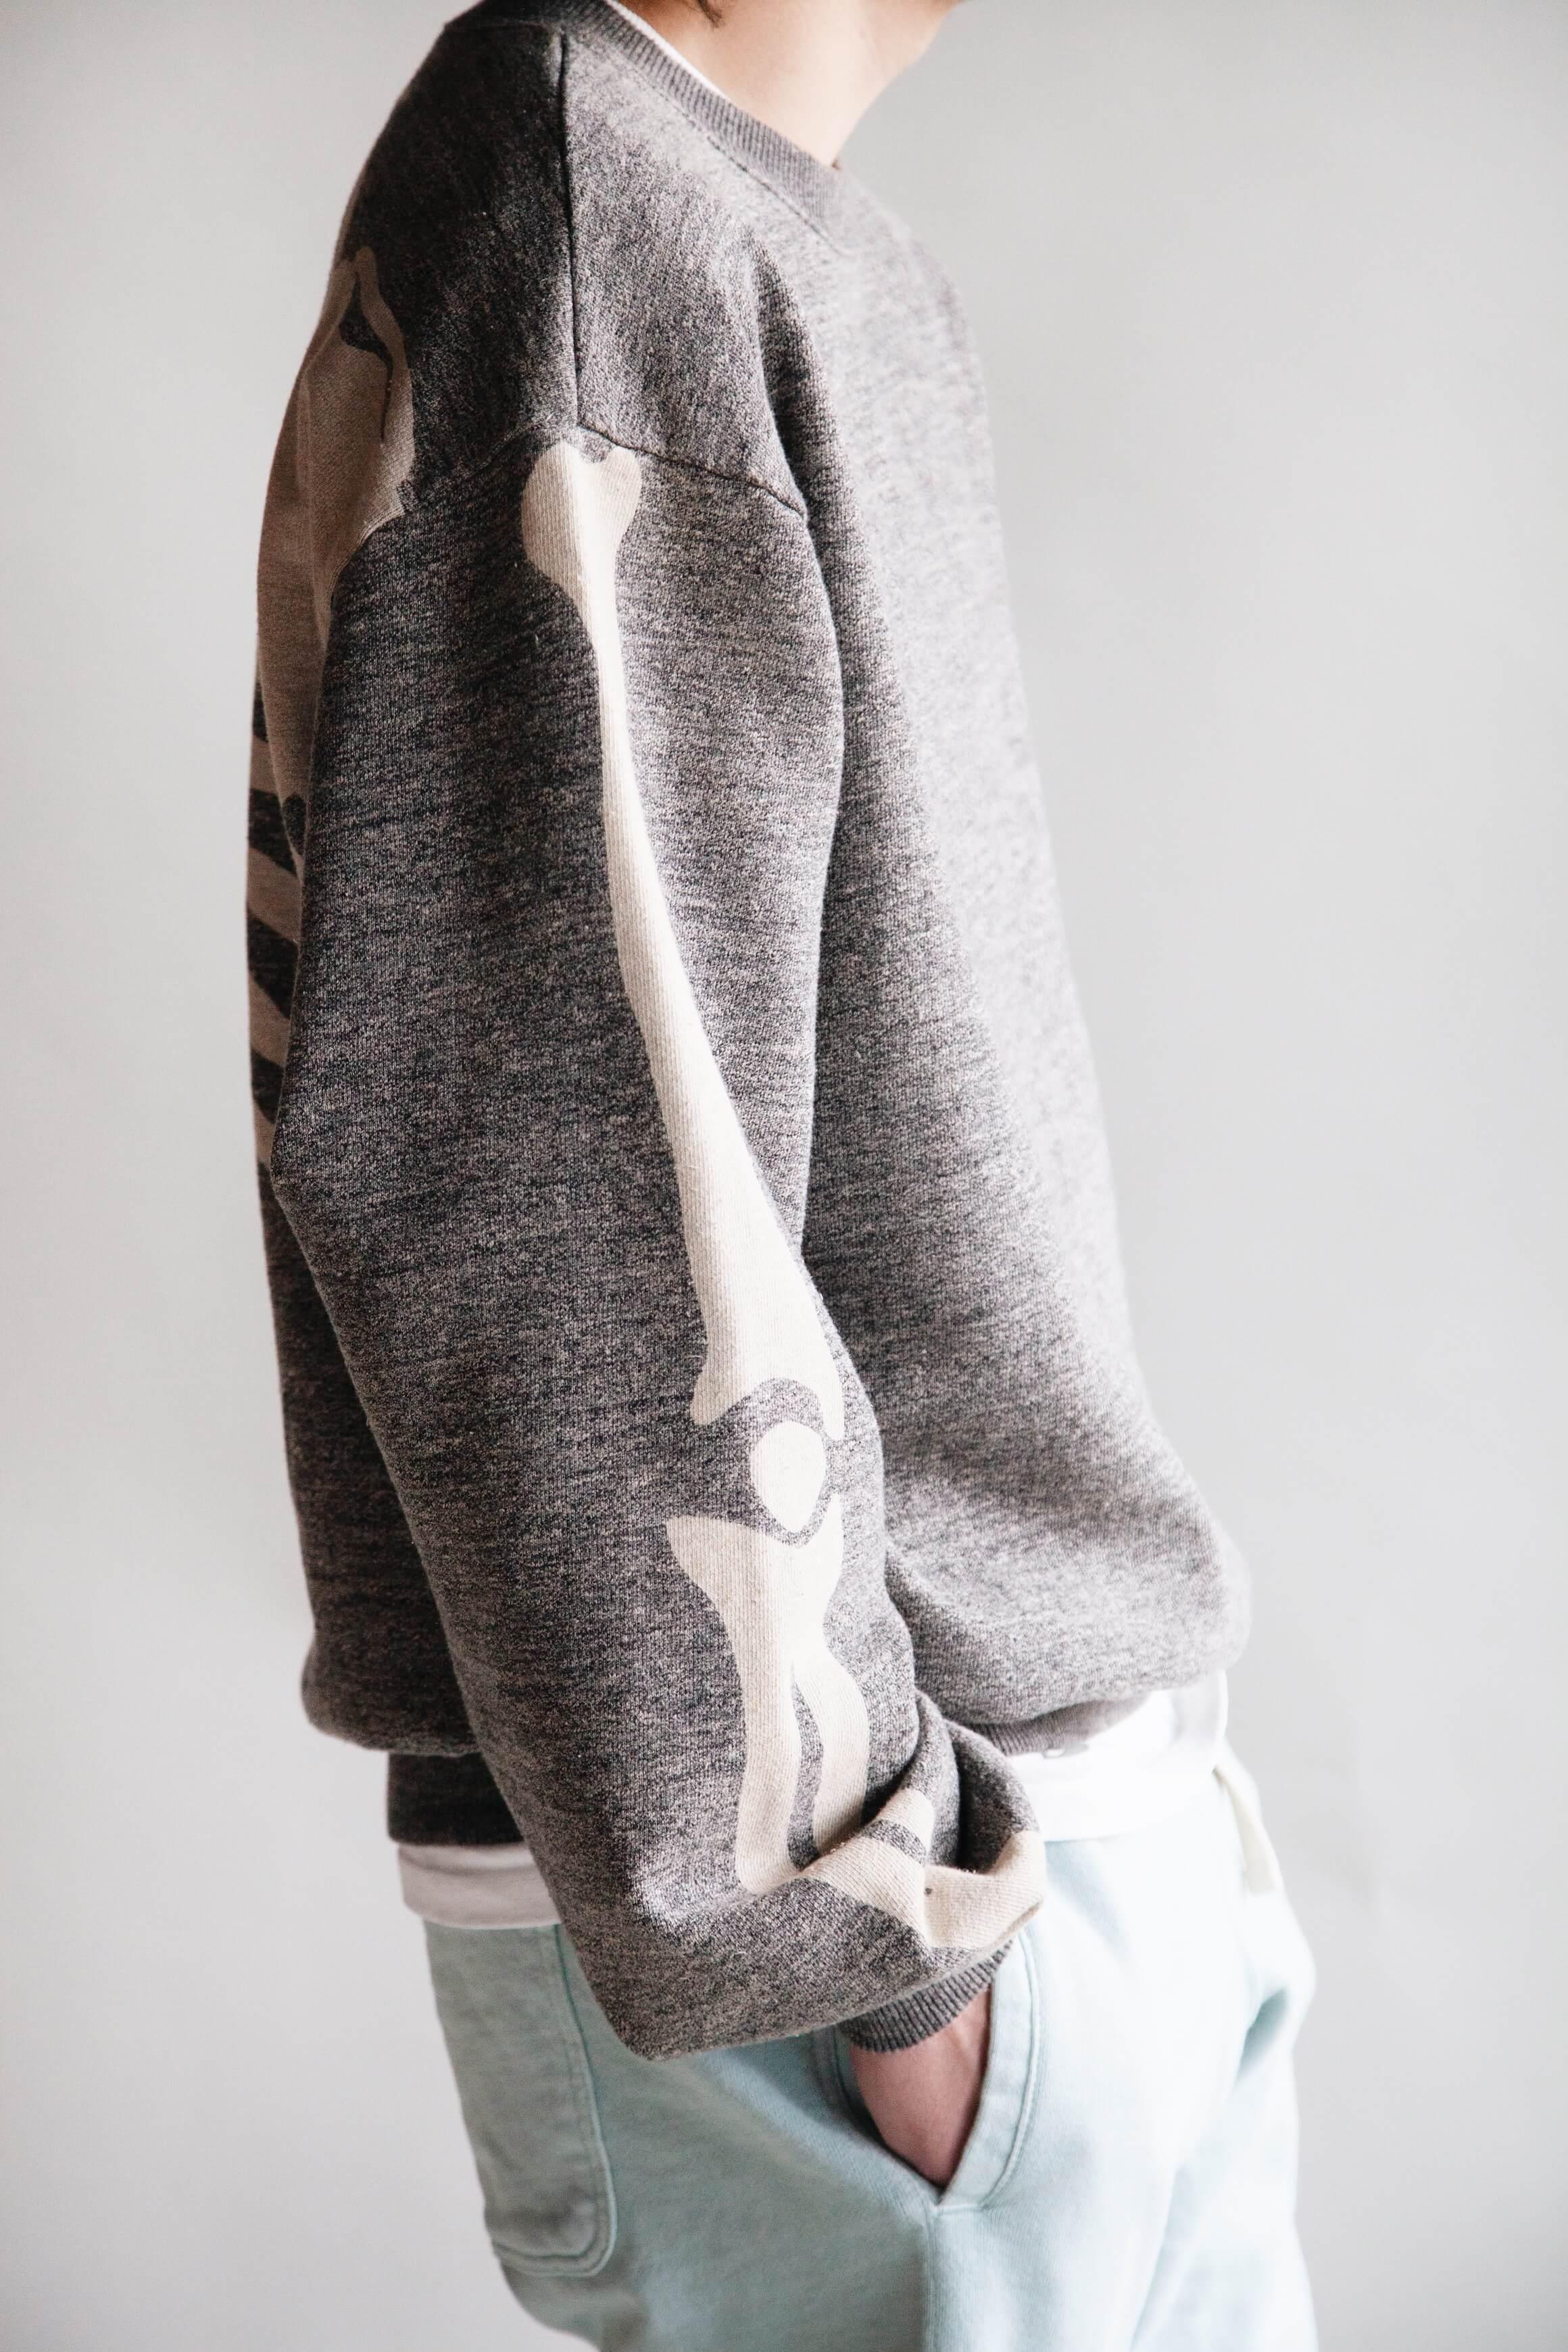 Kapital clothing japan grandrelle fleece knit big crew bone sweatshirt, beams plus athletic shorts, anonymous ism uneven dye socks and hender scheme mip-14 boots on body